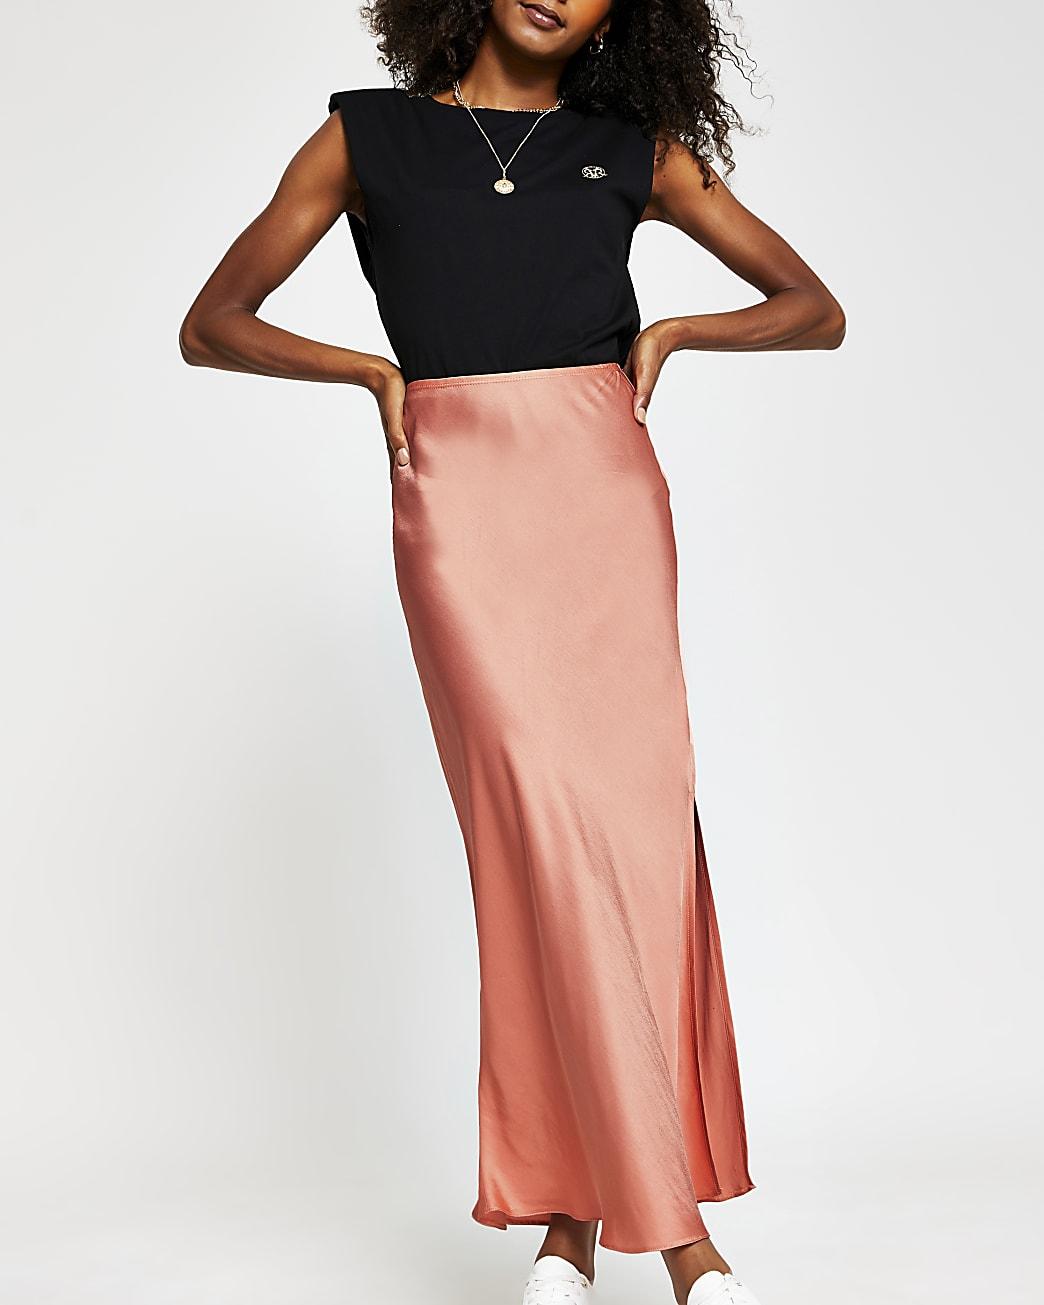 Coral side split satin skirt